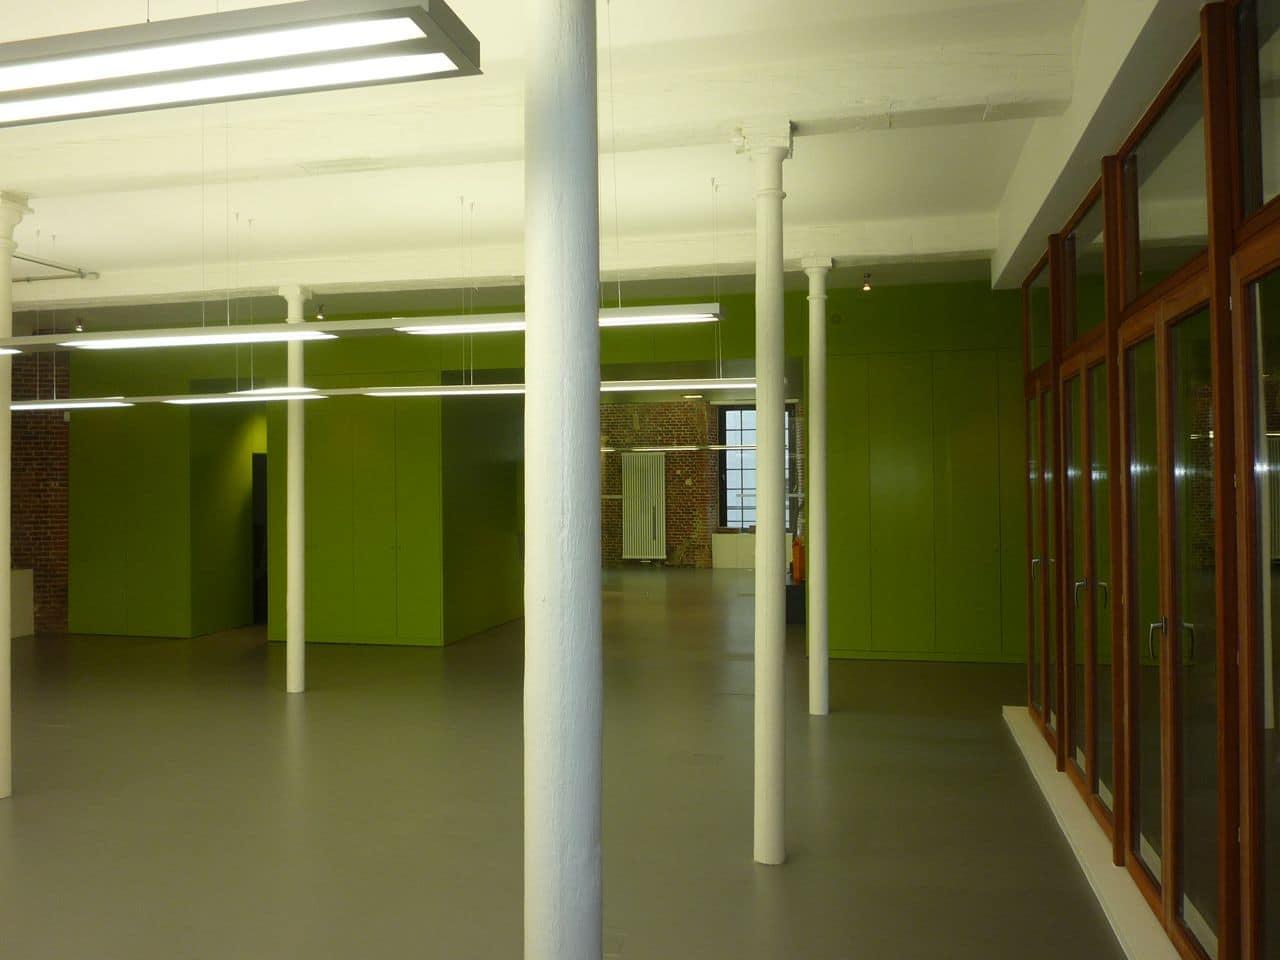 P1060697 | Baeyens & Beck architecten Gent | architect nieuwbouw renovatie interieur | high end | architectenbureau